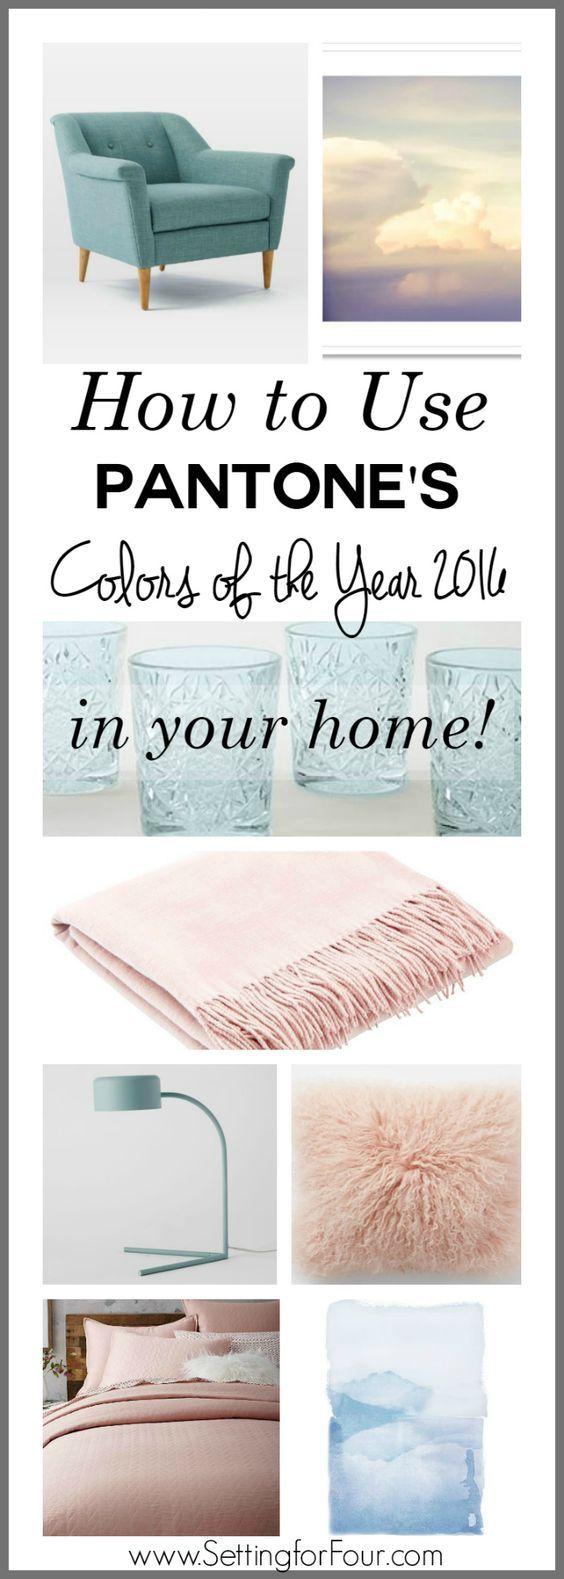 120 best images about rose quartz serenity pantone color of the year 2016 on pinterest. Black Bedroom Furniture Sets. Home Design Ideas